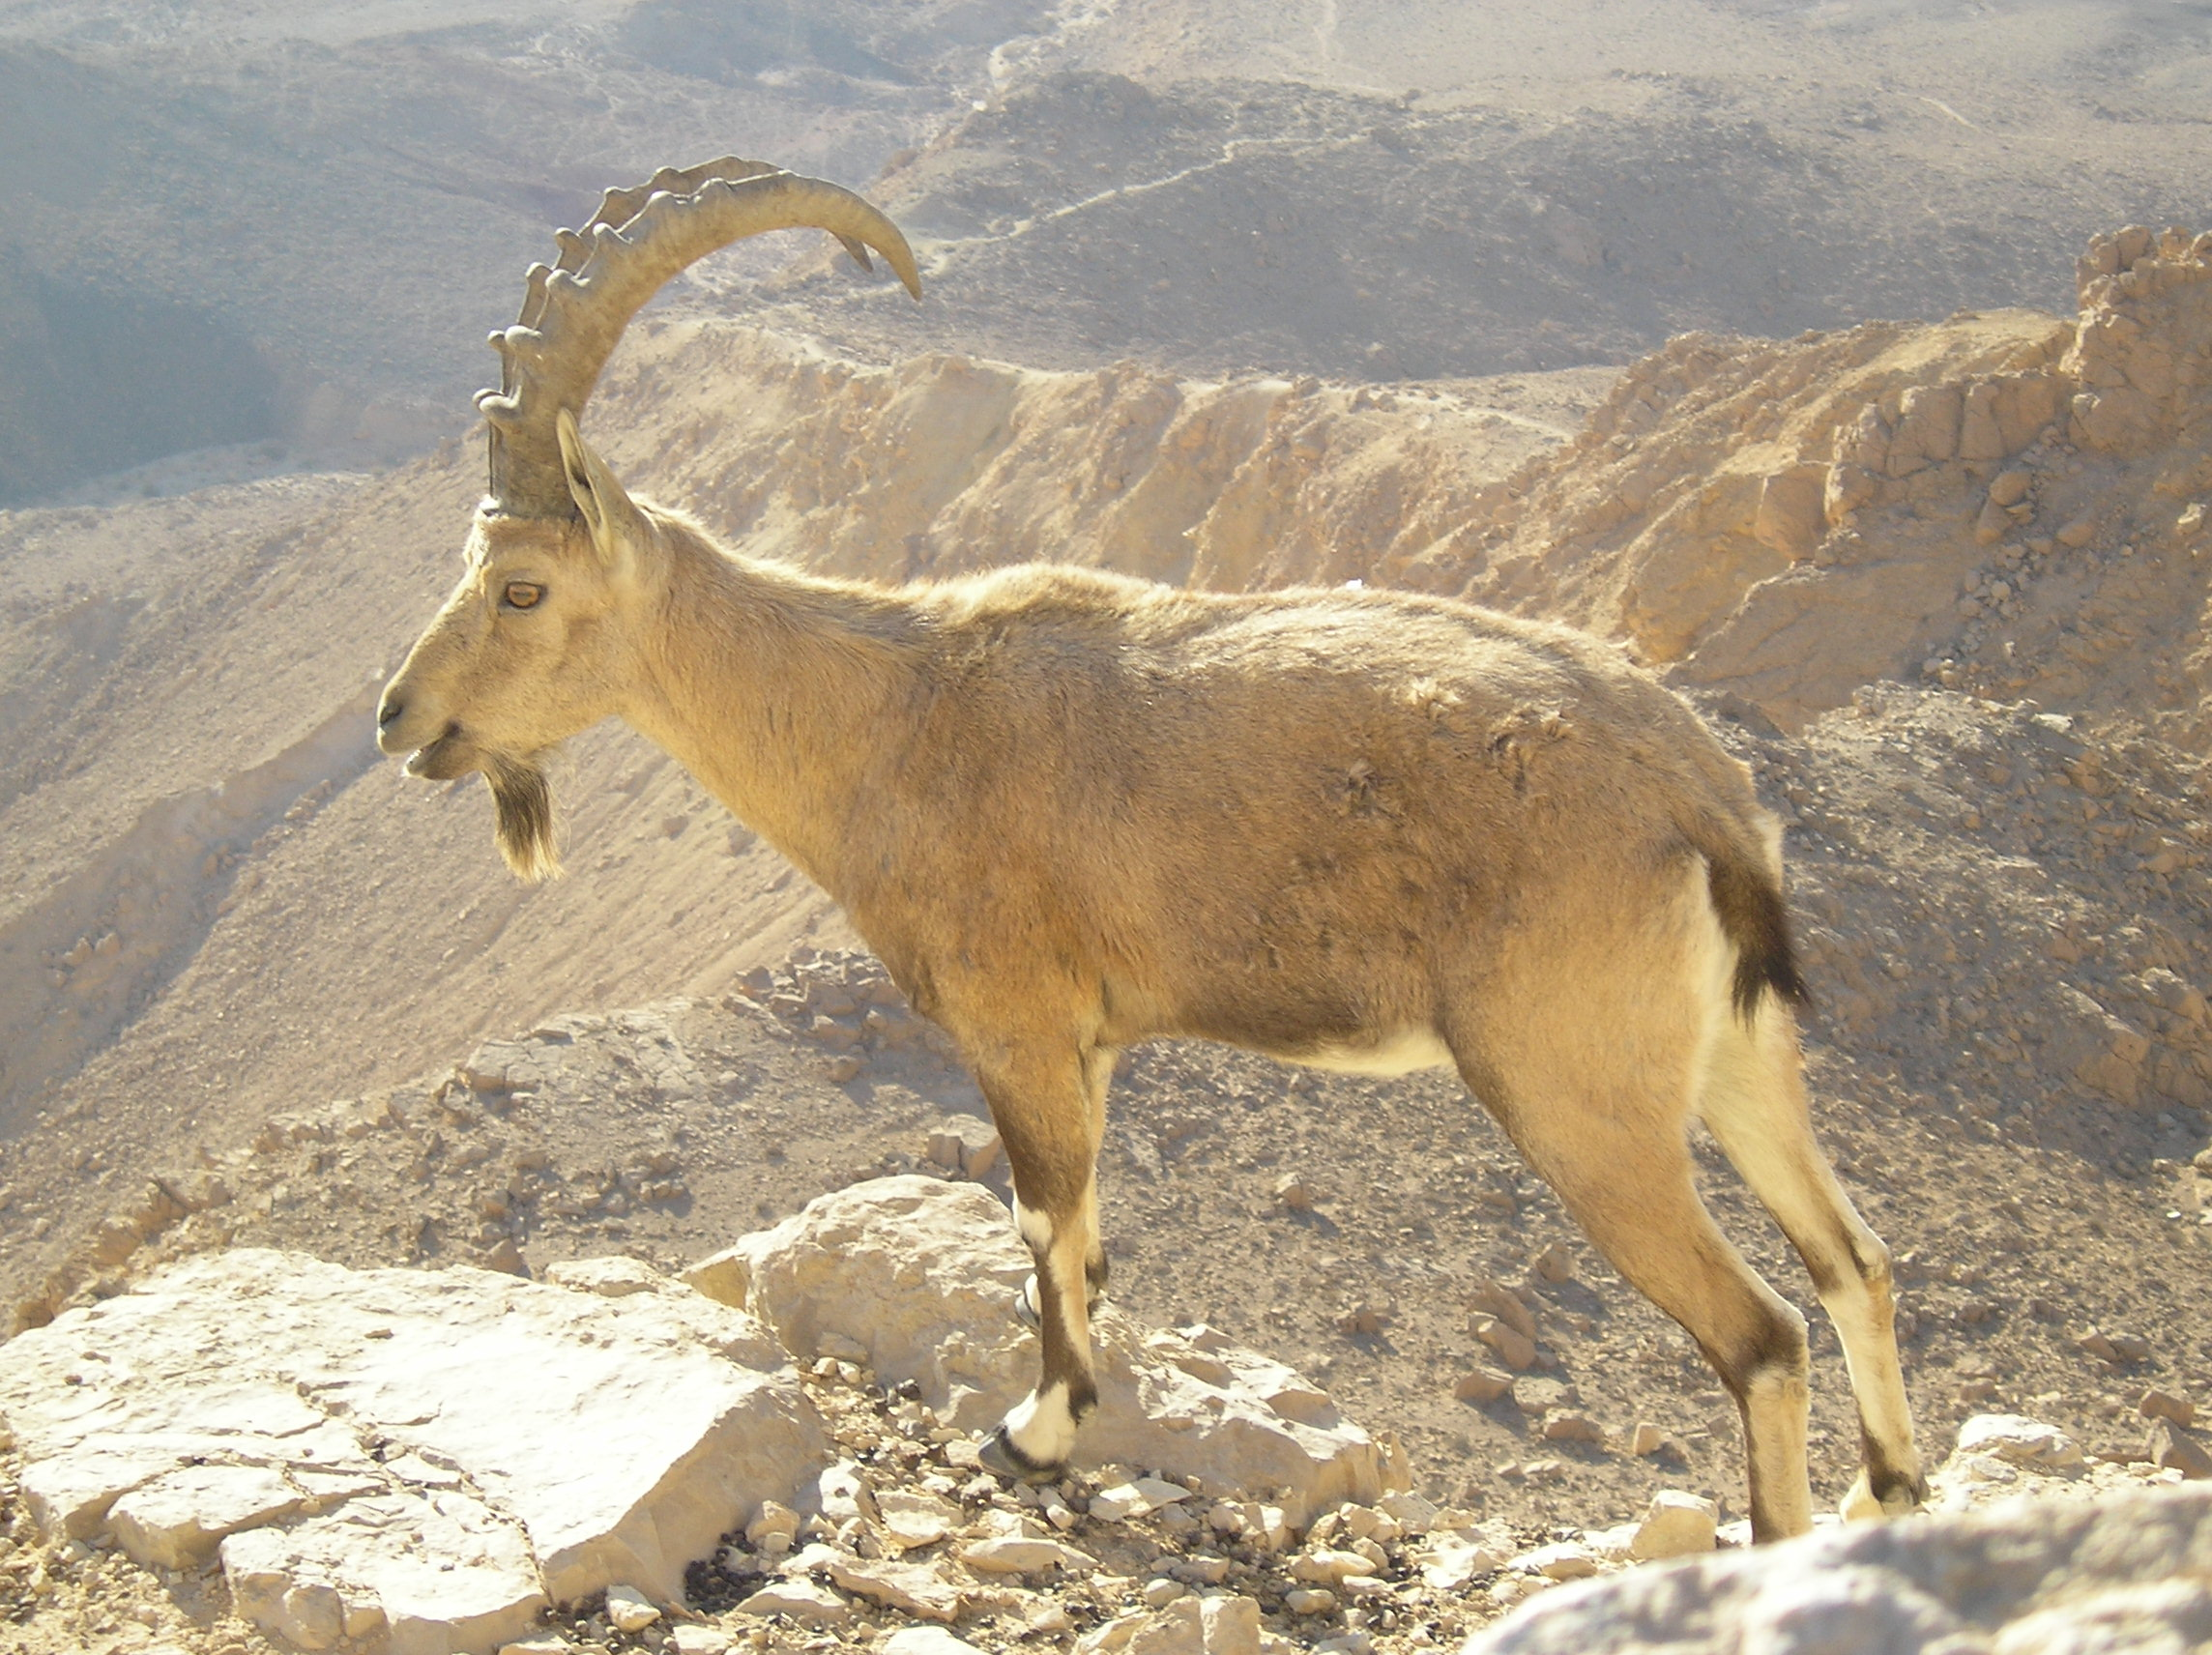 https://upload.wikimedia.org/wikipedia/commons/7/75/Nubian_Ibex_in_Negev.JPG